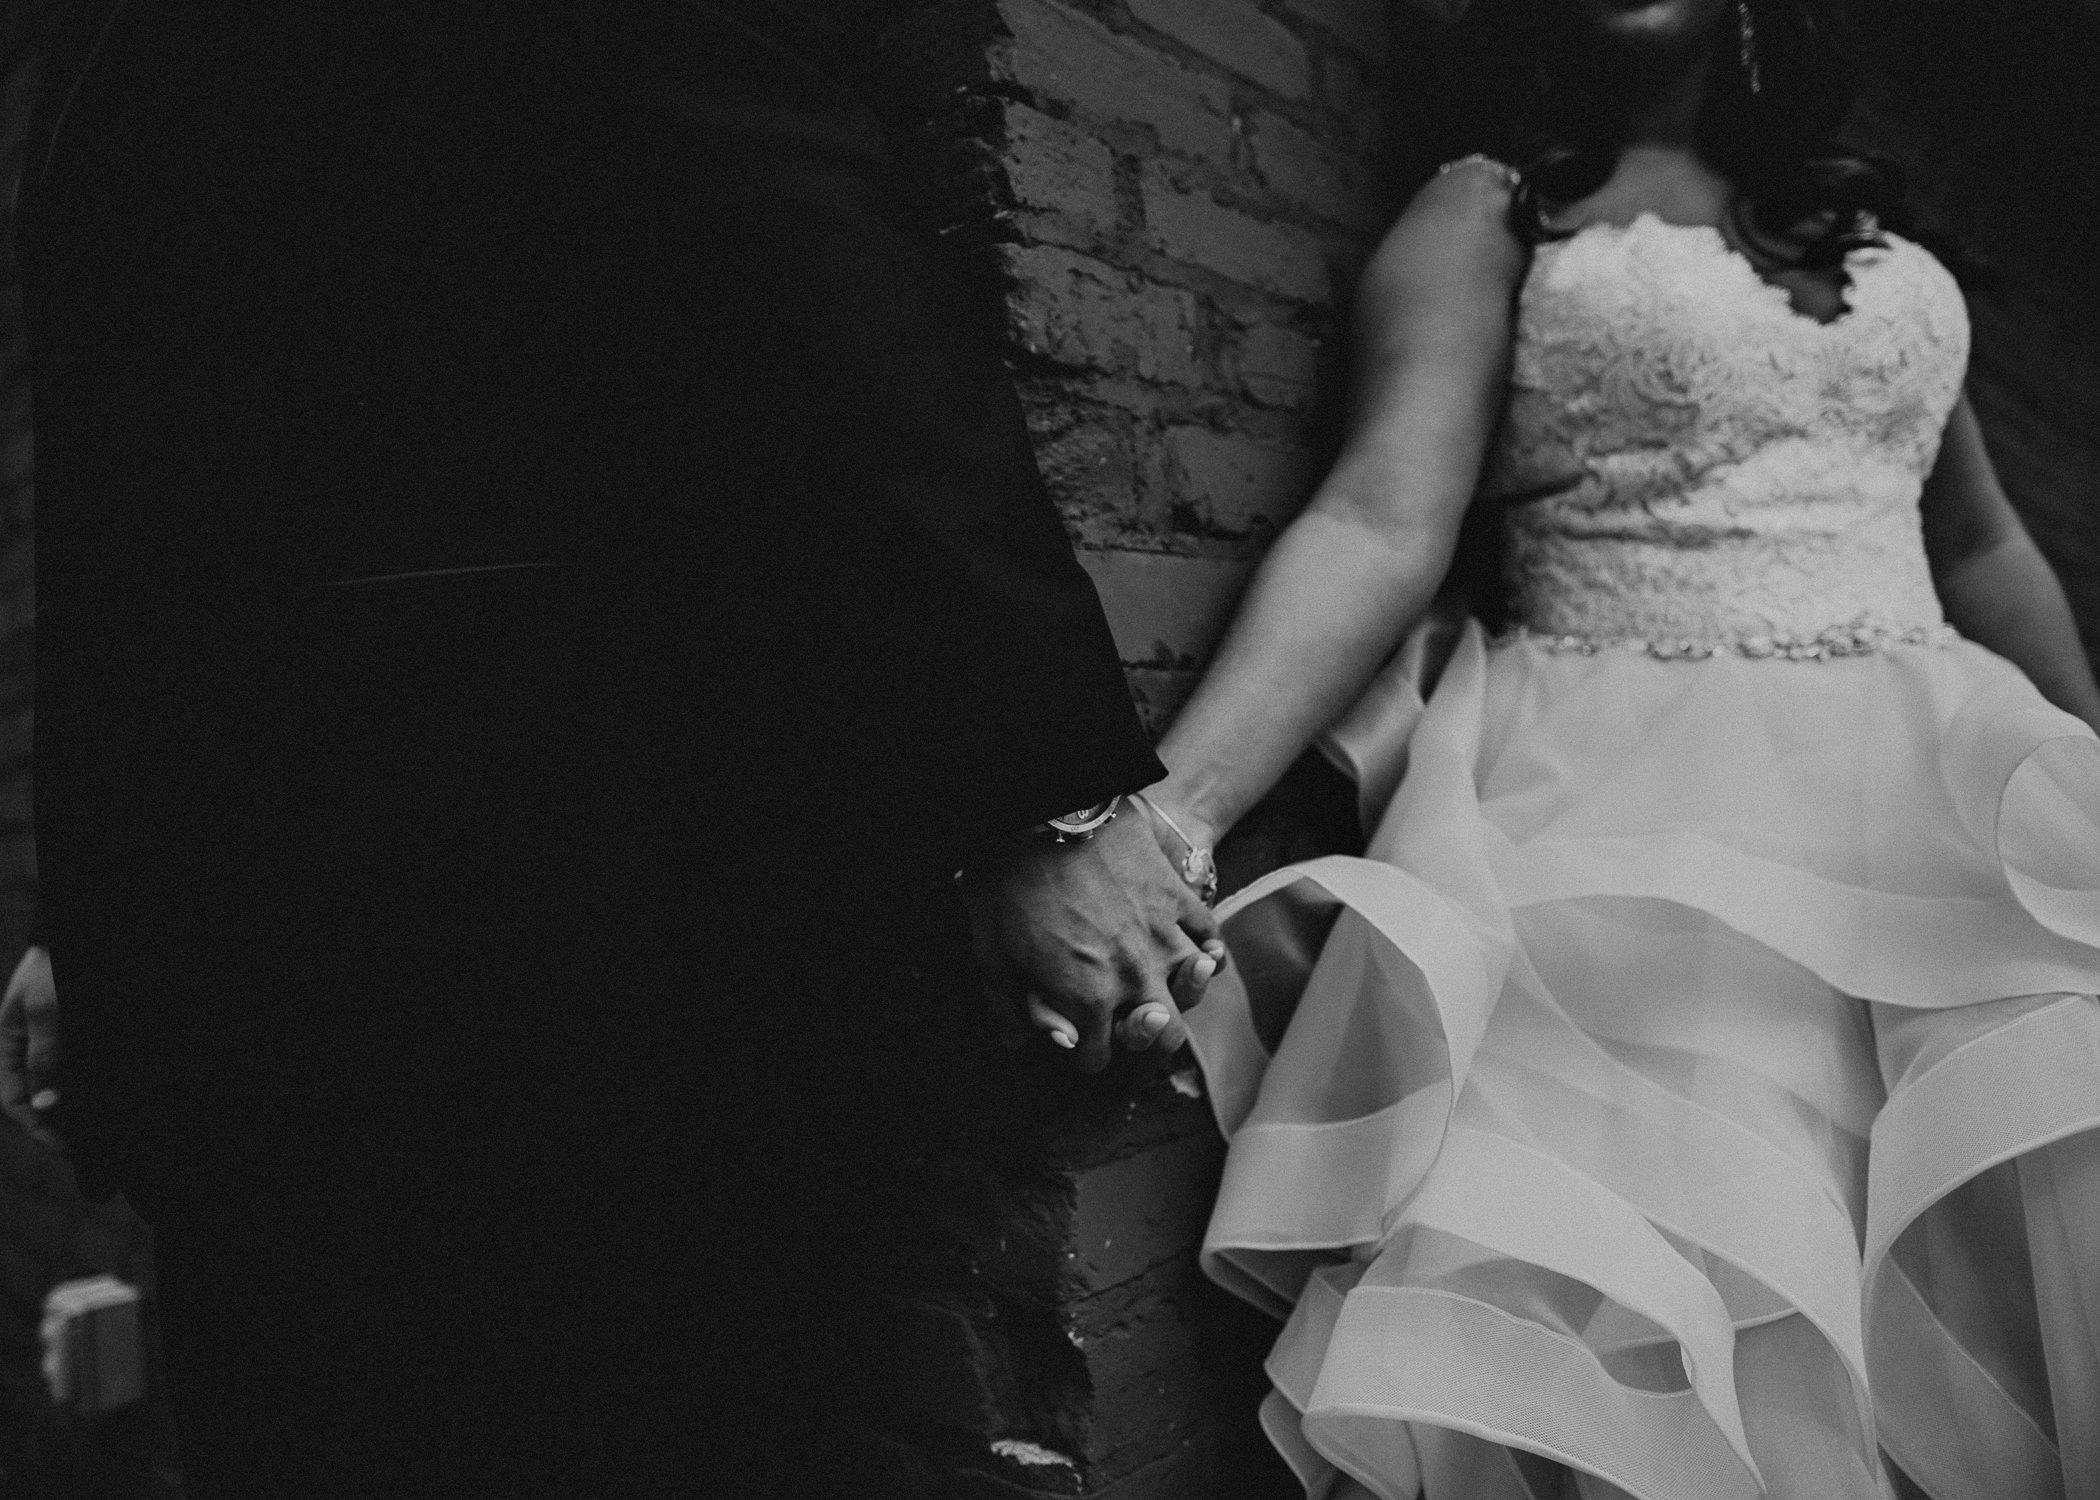 19 4 - Atlanta Wedding Photographer - The engine room - Ga - Wedding trends - Aline Marin Photography.jpg